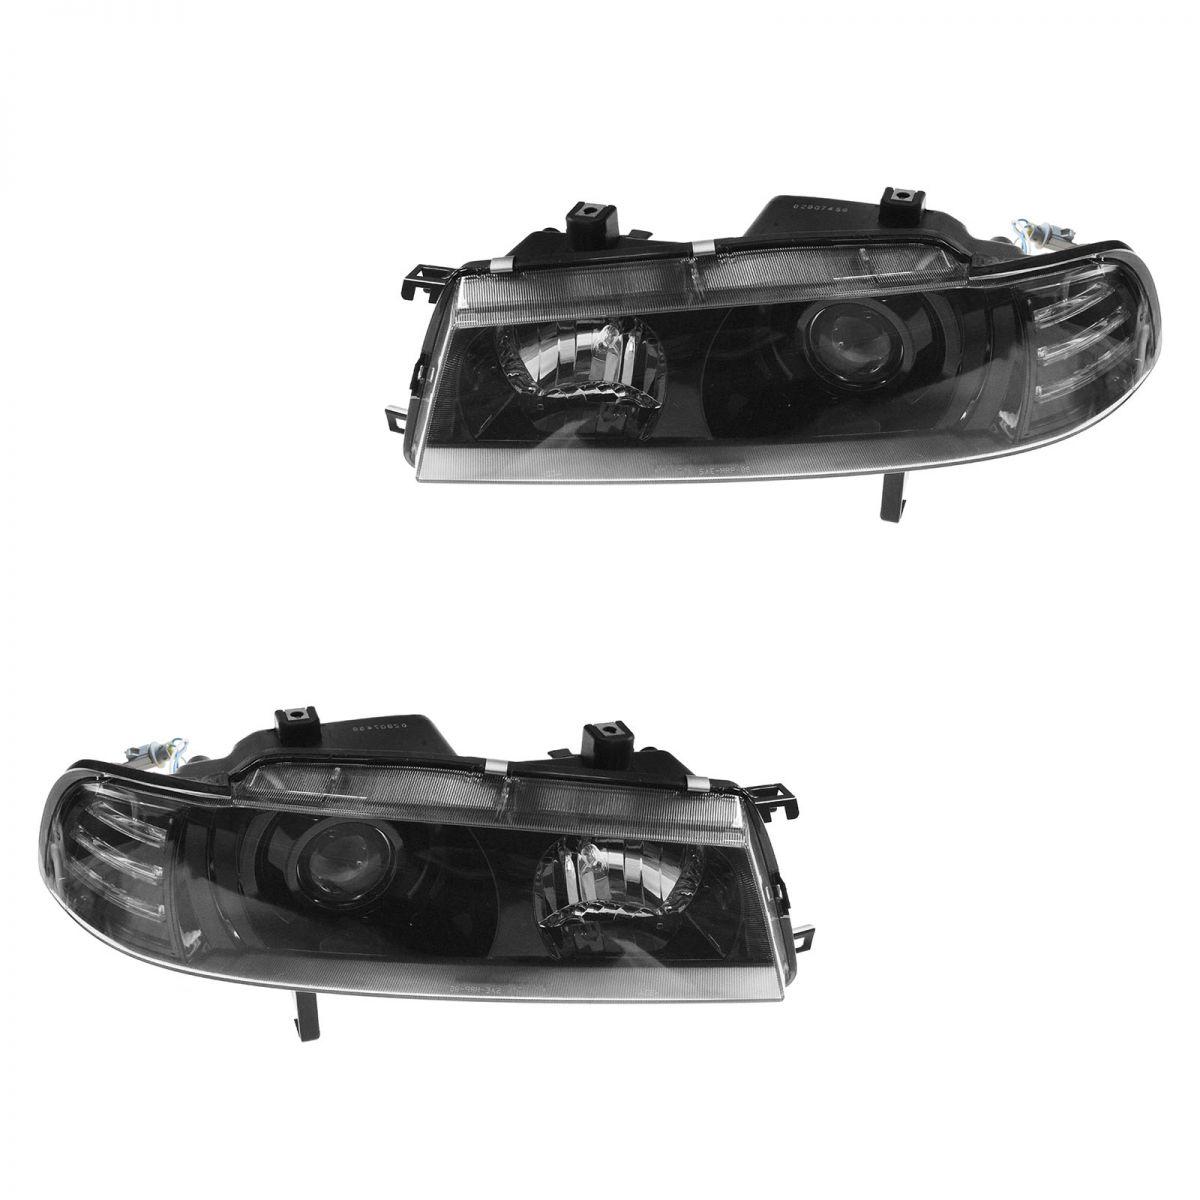 1992 honda prelude headlight wiring diagram 2002 jetta cooling fan black bezel performance projector style pair for